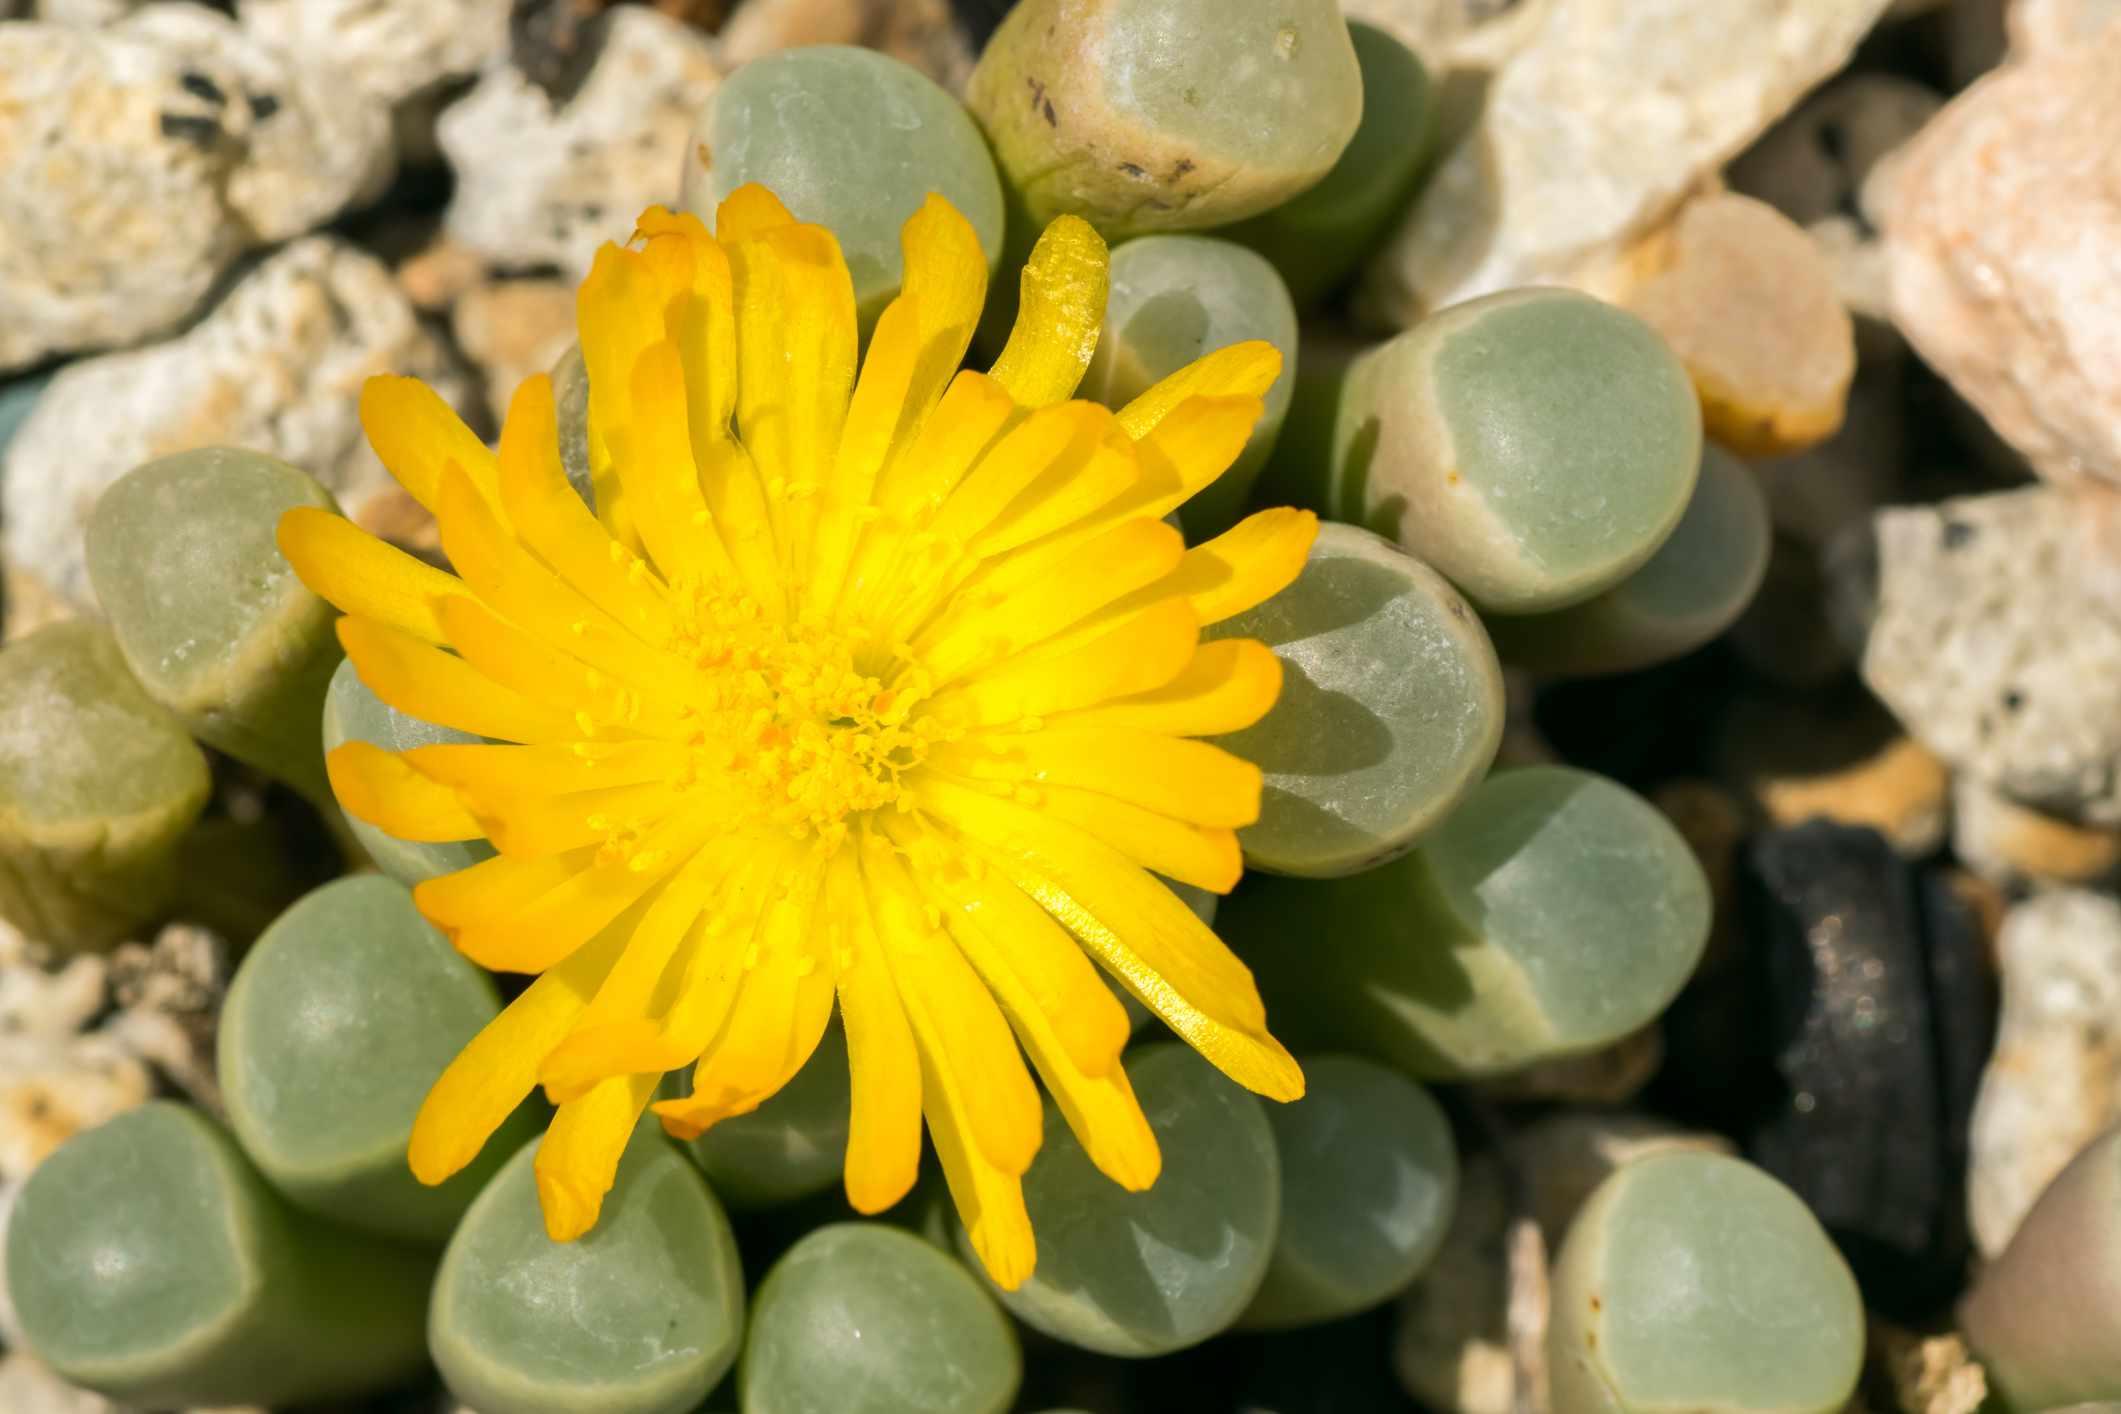 Fenestraria rhopalophyllaaka baby toes succulent bright yellow flower.